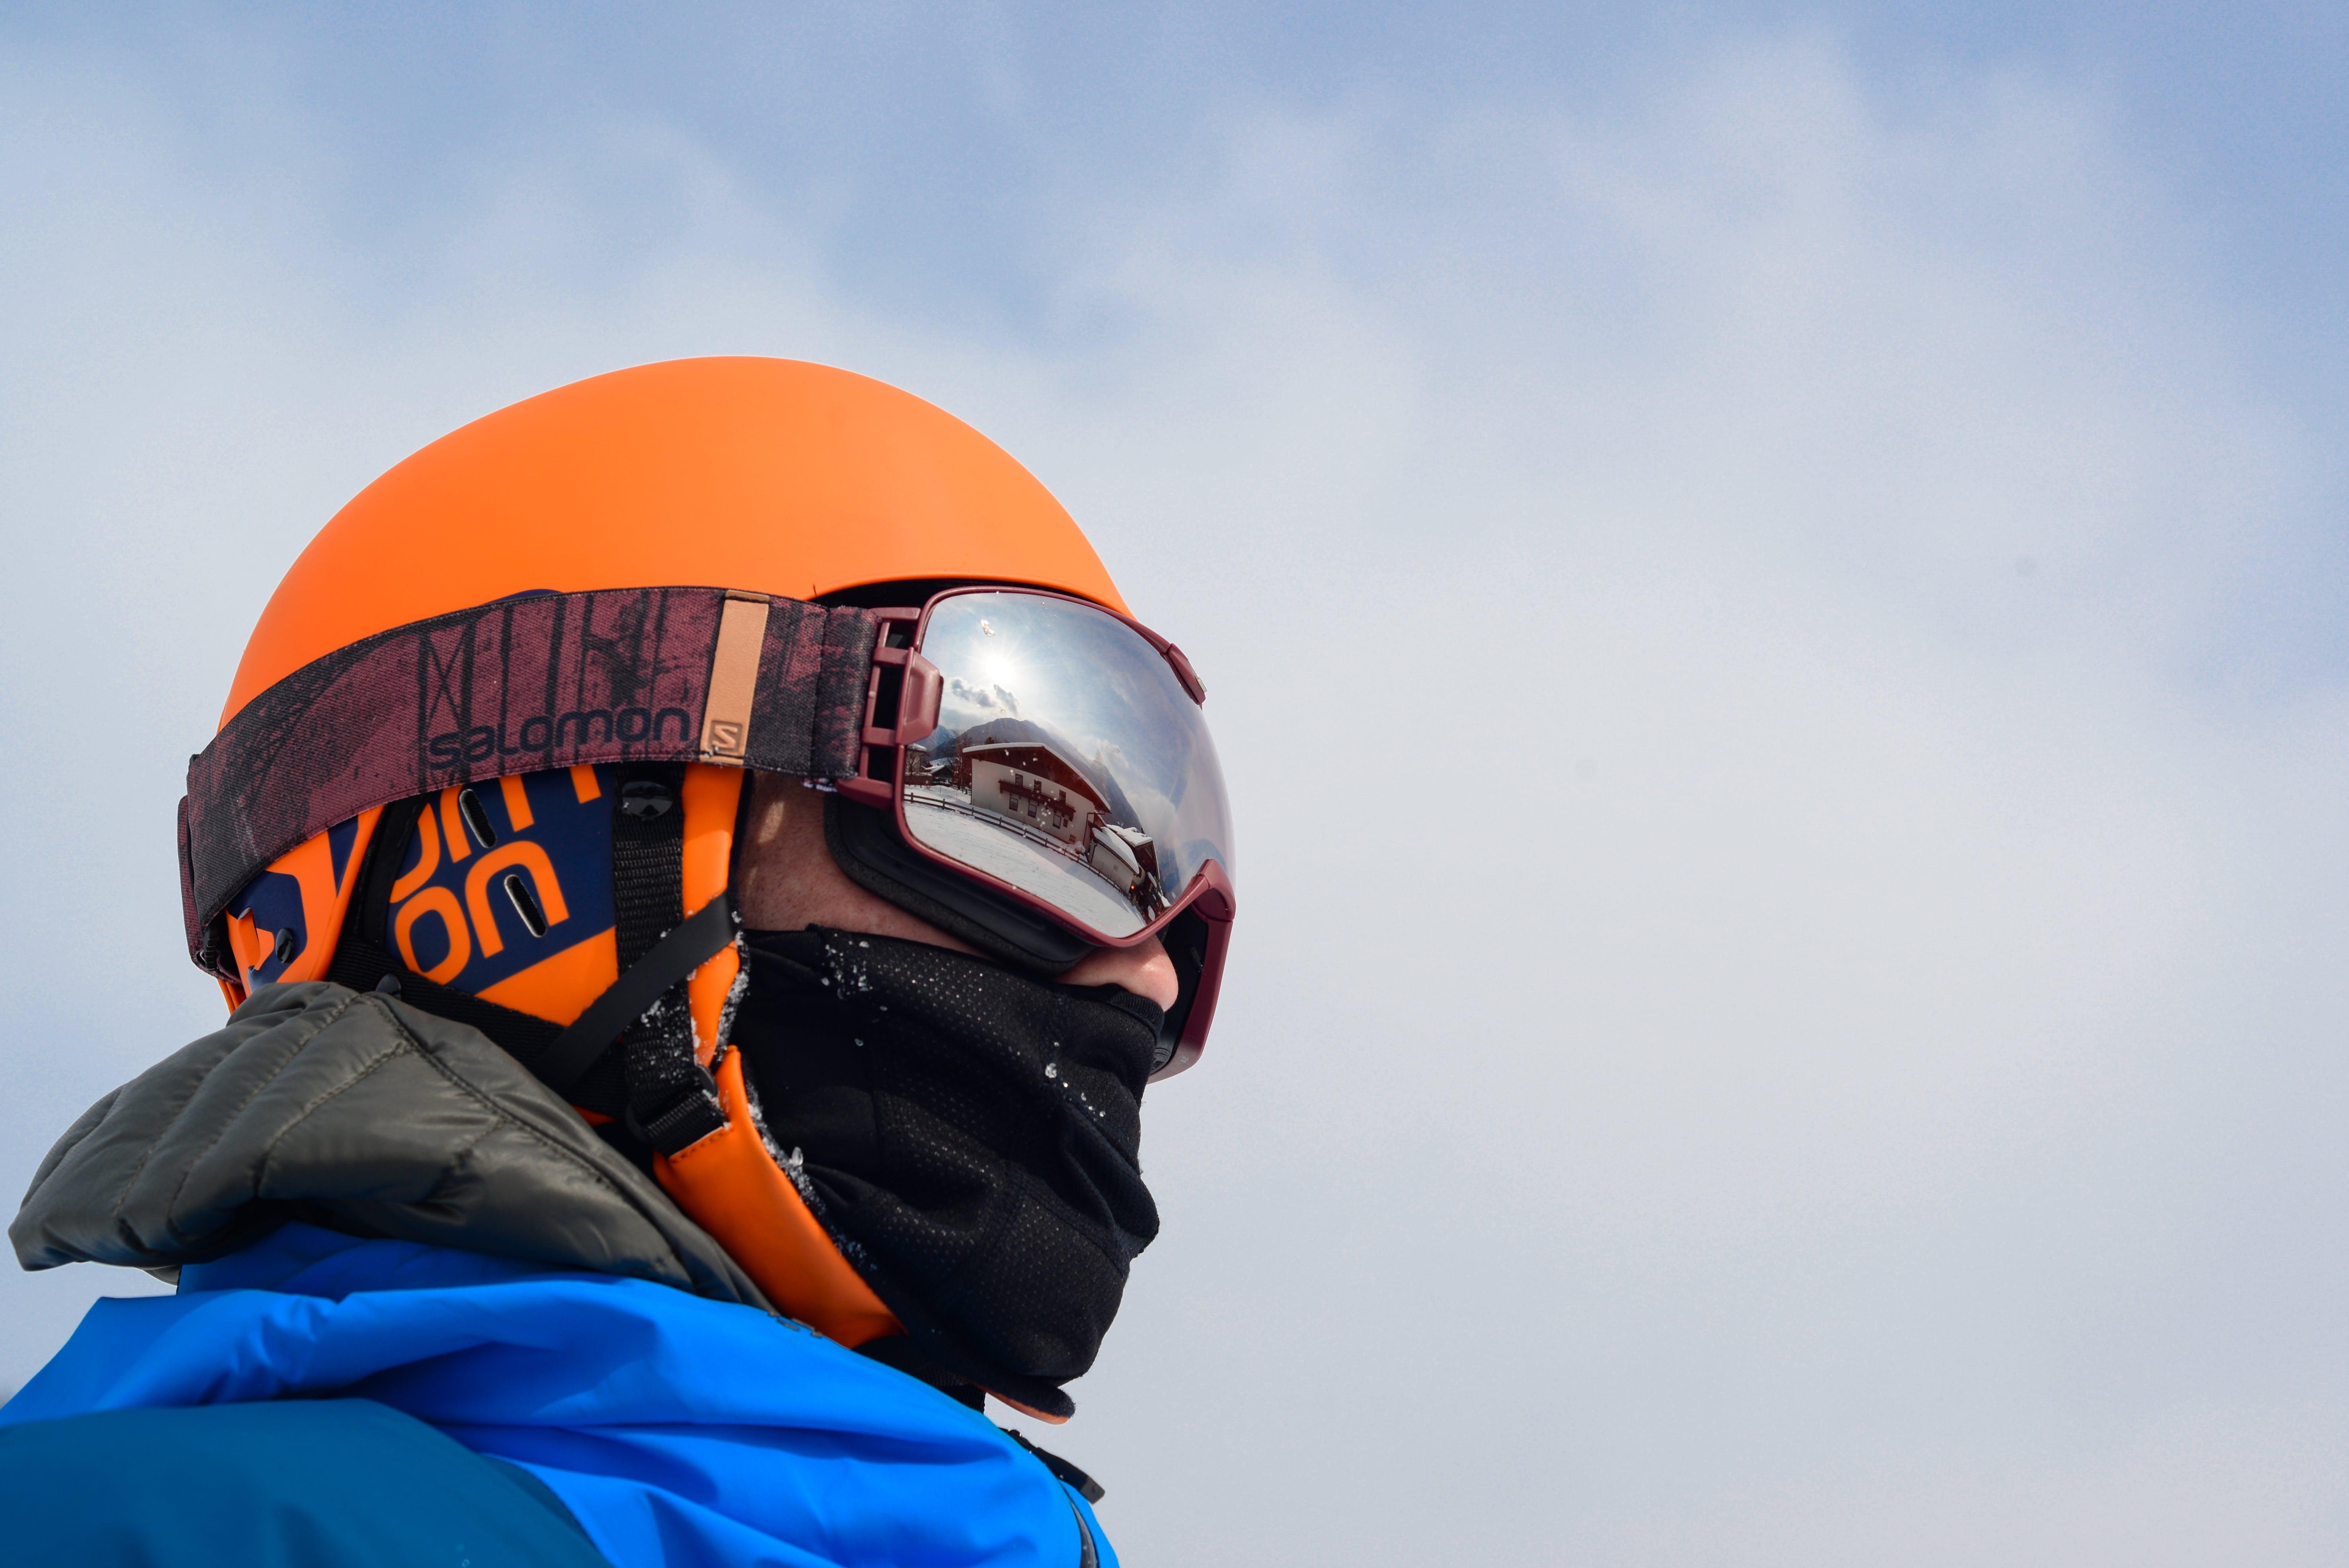 Person Wearing Orange Helmet